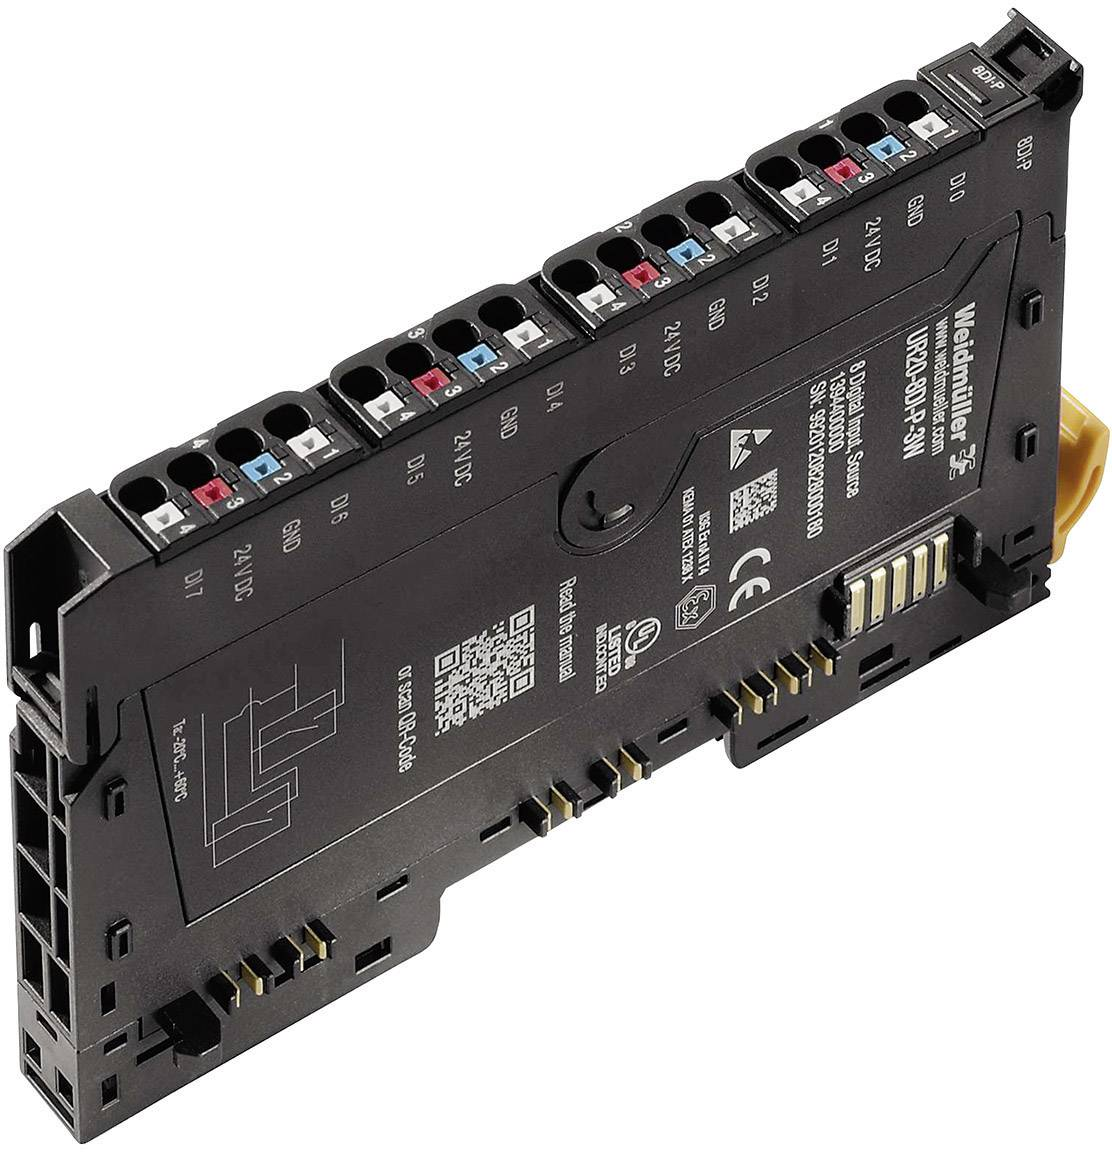 Vstupní modul pro PLC Weidmüller UR20-8DI-P-3W, 1394400000